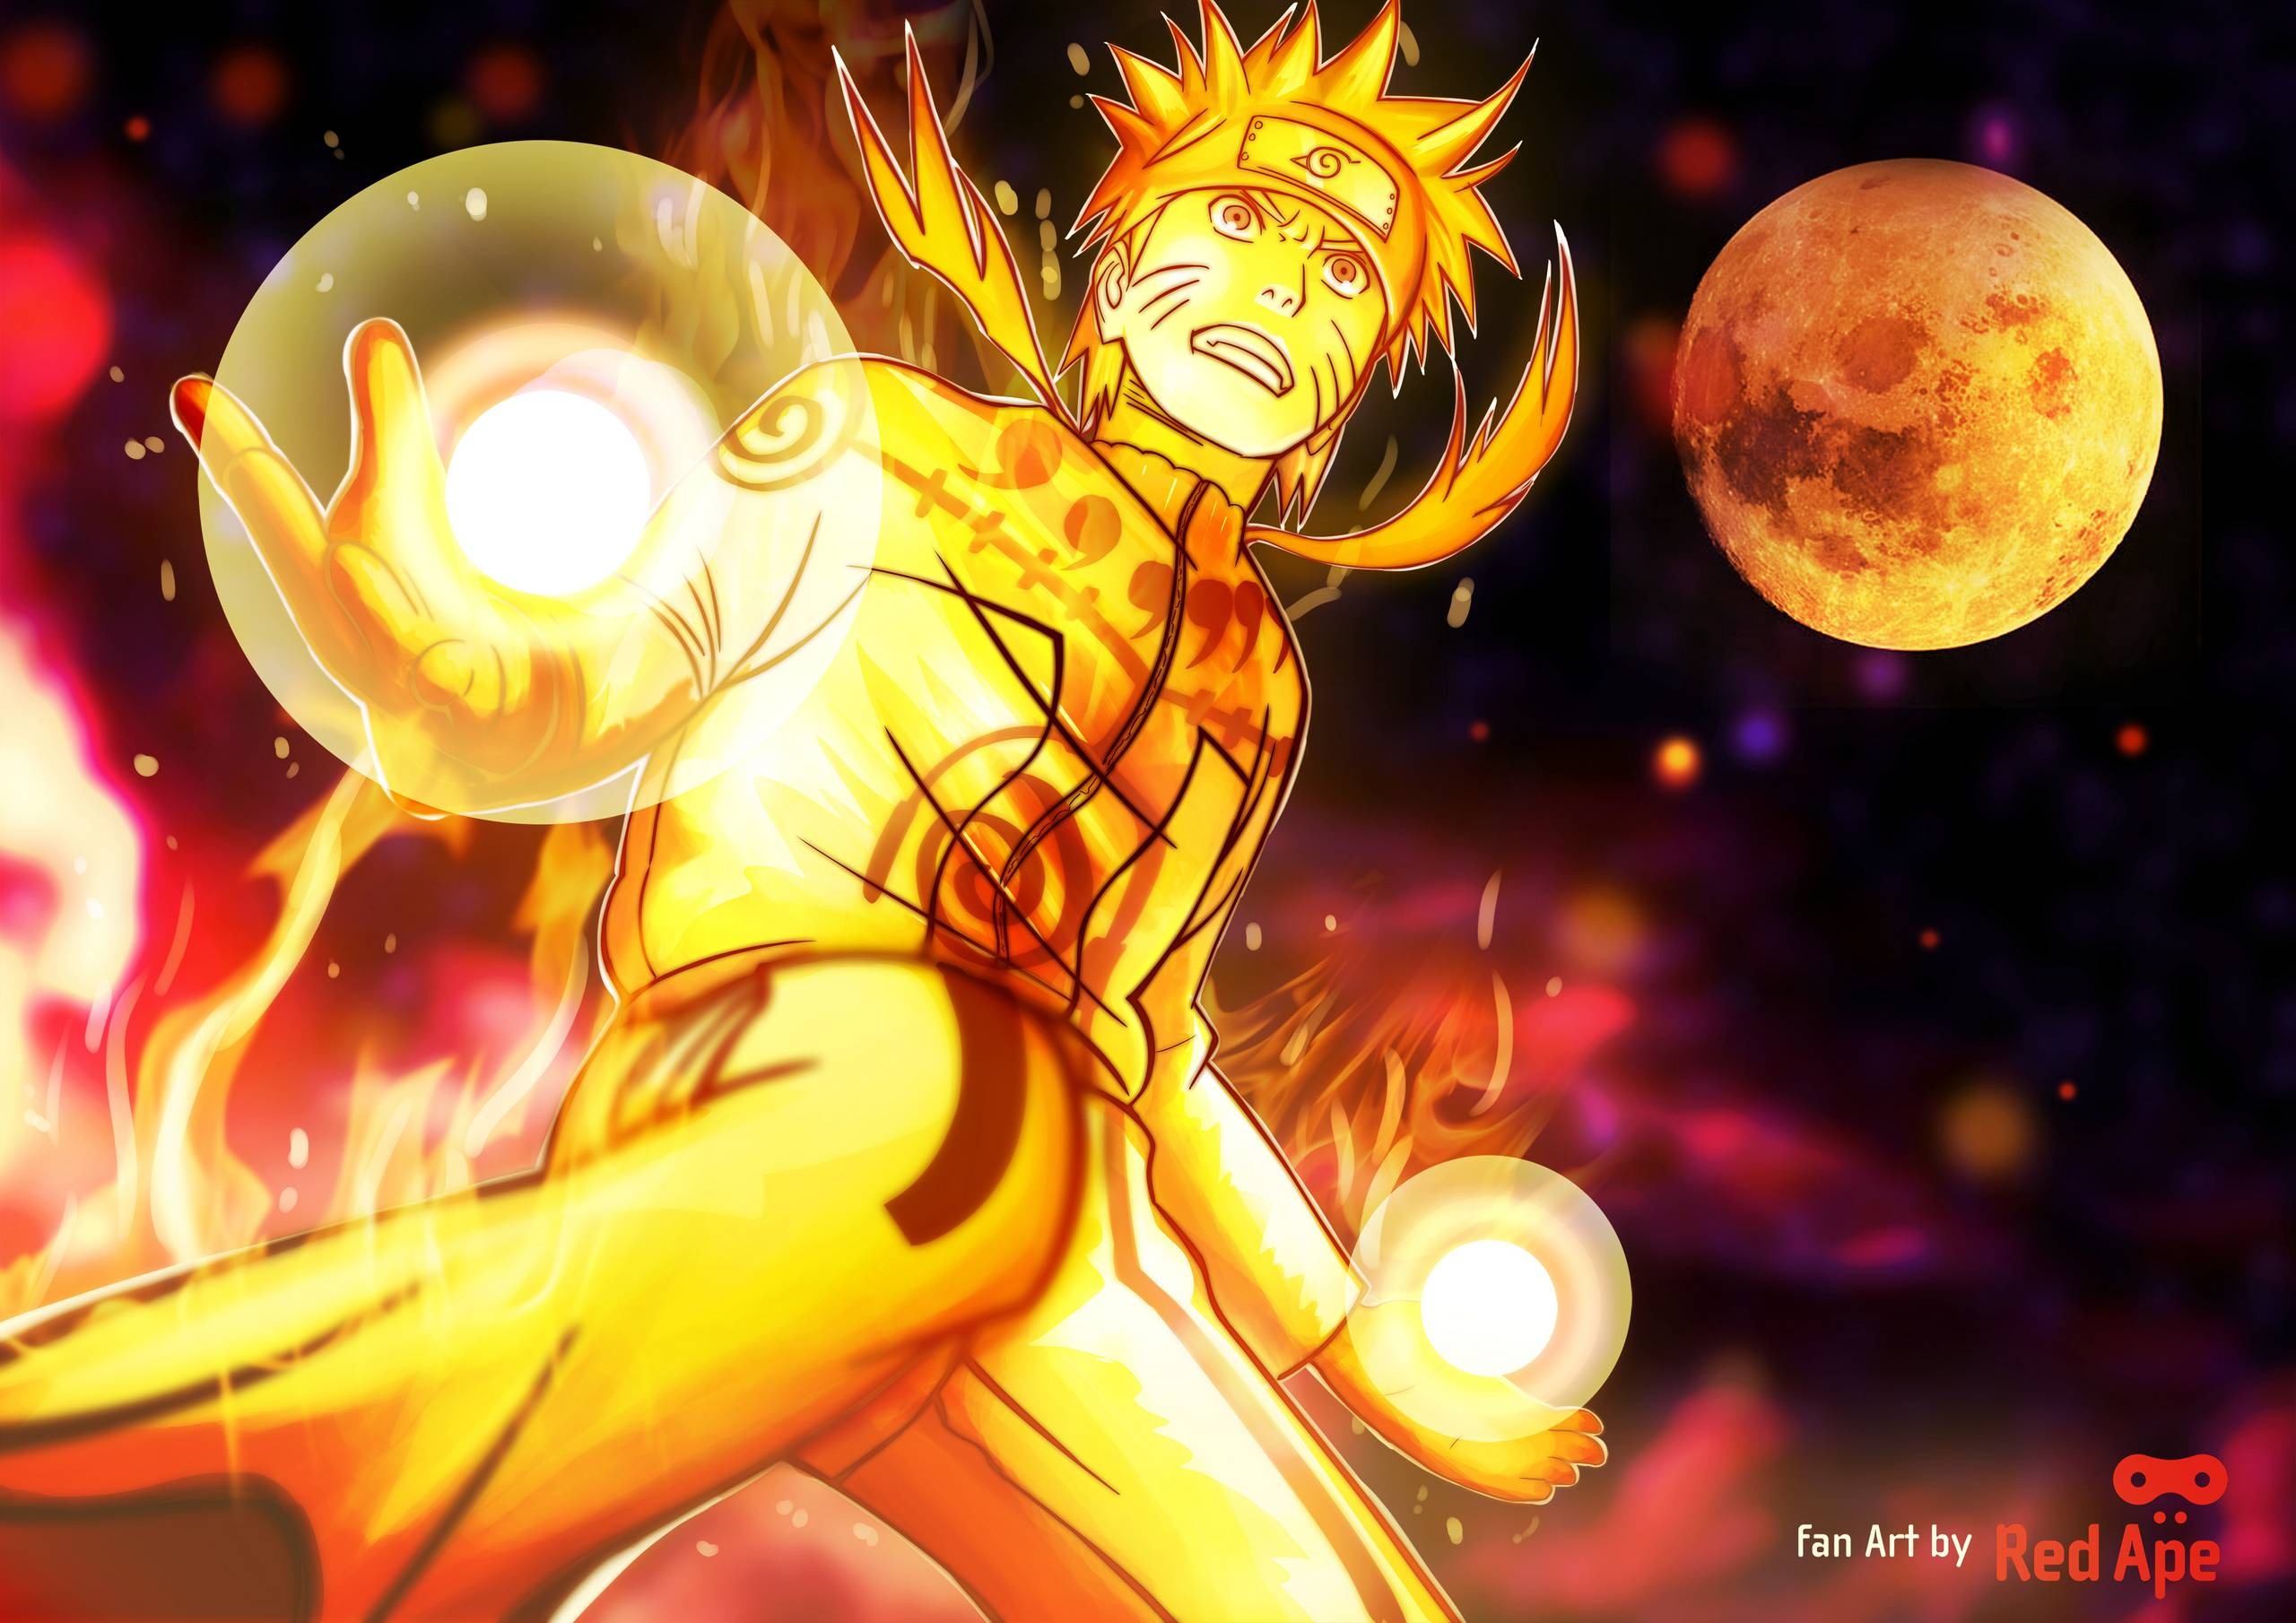 Naruto wallpaper for tablet impremedia naruto shippuden wallpaper free for tablet wolcartoon voltagebd Images